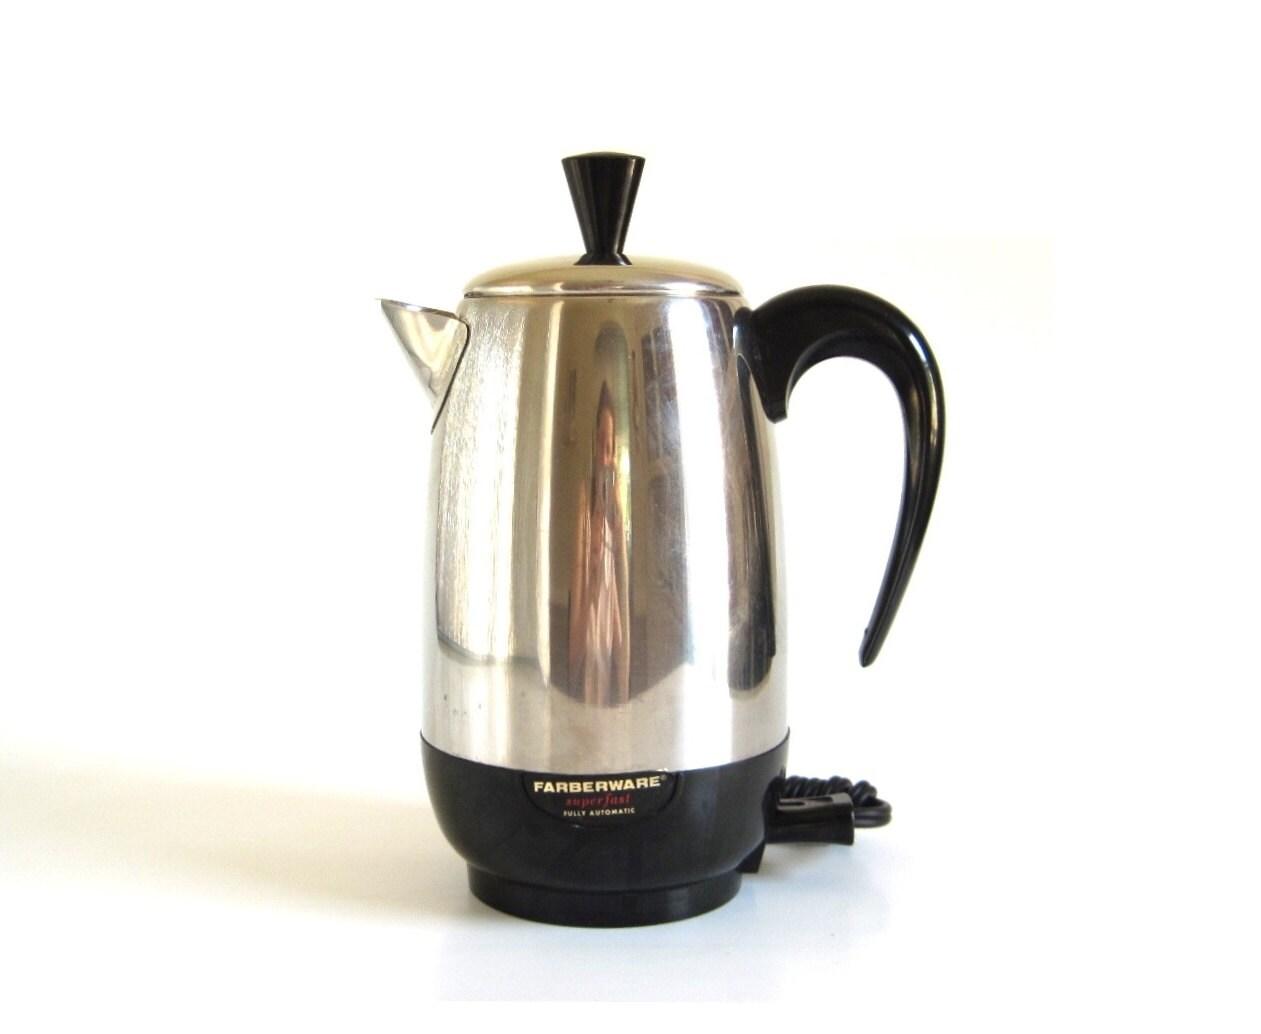 Farberware Coffee Pot Electric Cord : Farberware Superfast Coffee Pot Electric Percolator 138-B Made